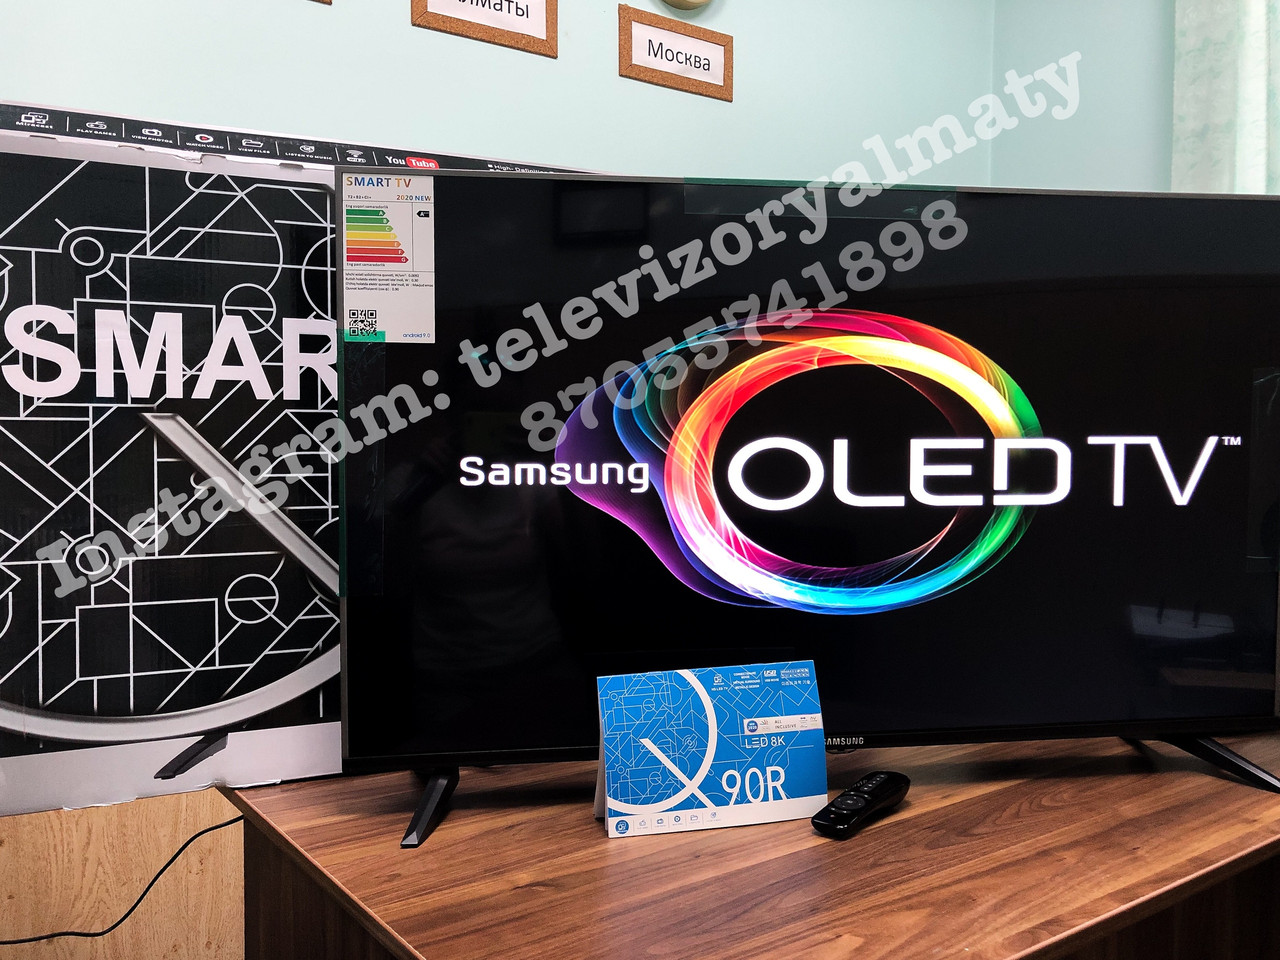 Телевизор LED TV Samsung Smart tv 43 диагональ - фото 1